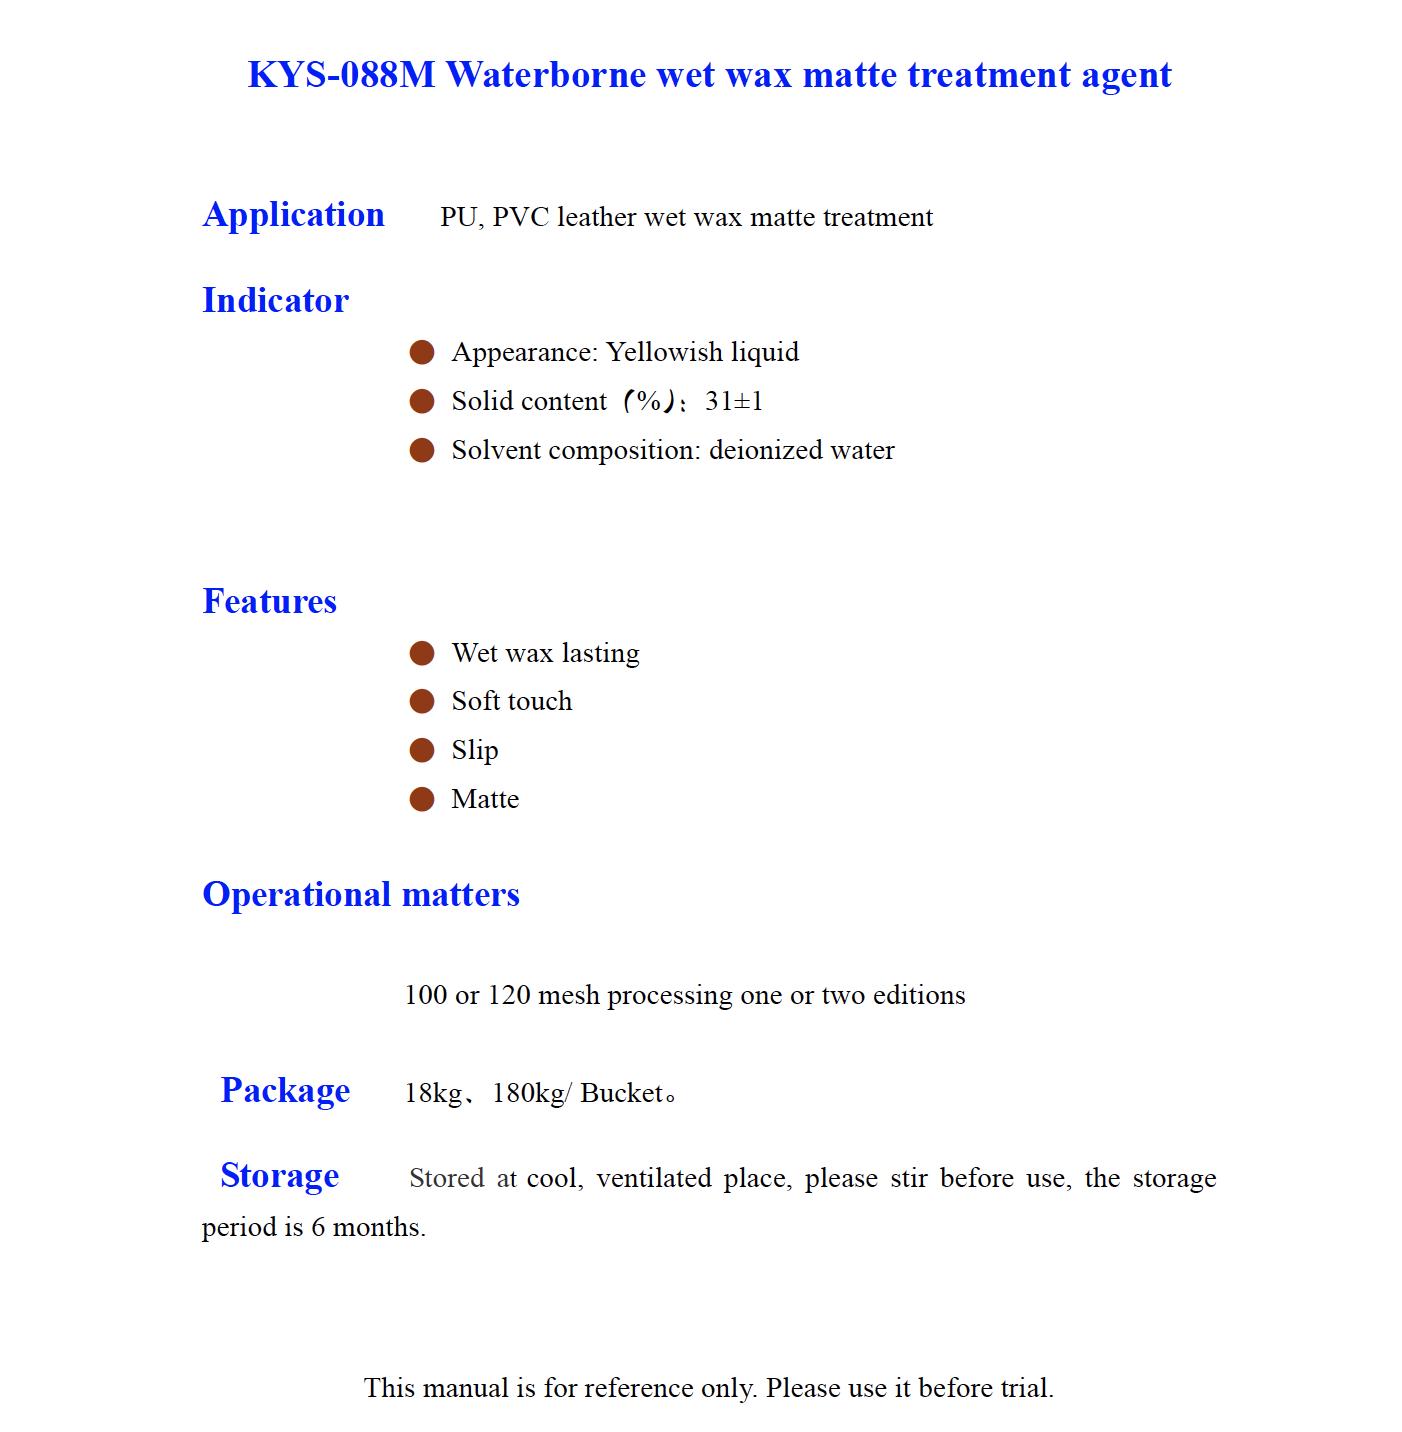 KYS 088M Waterborne wet wax matte treatment agent